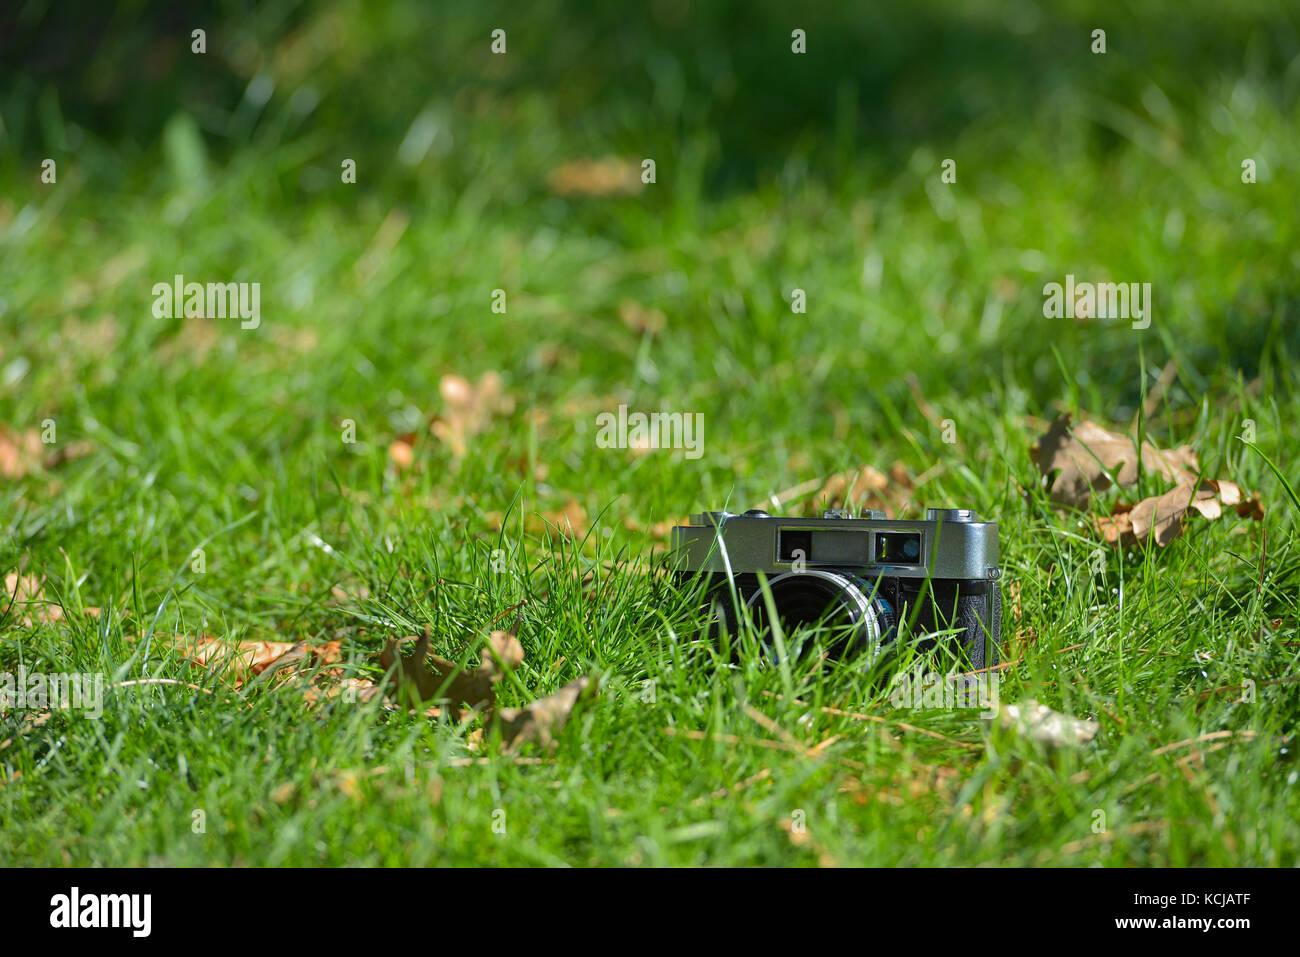 Entfernungsmesser kamera stockfotos entfernungsmesser kamera